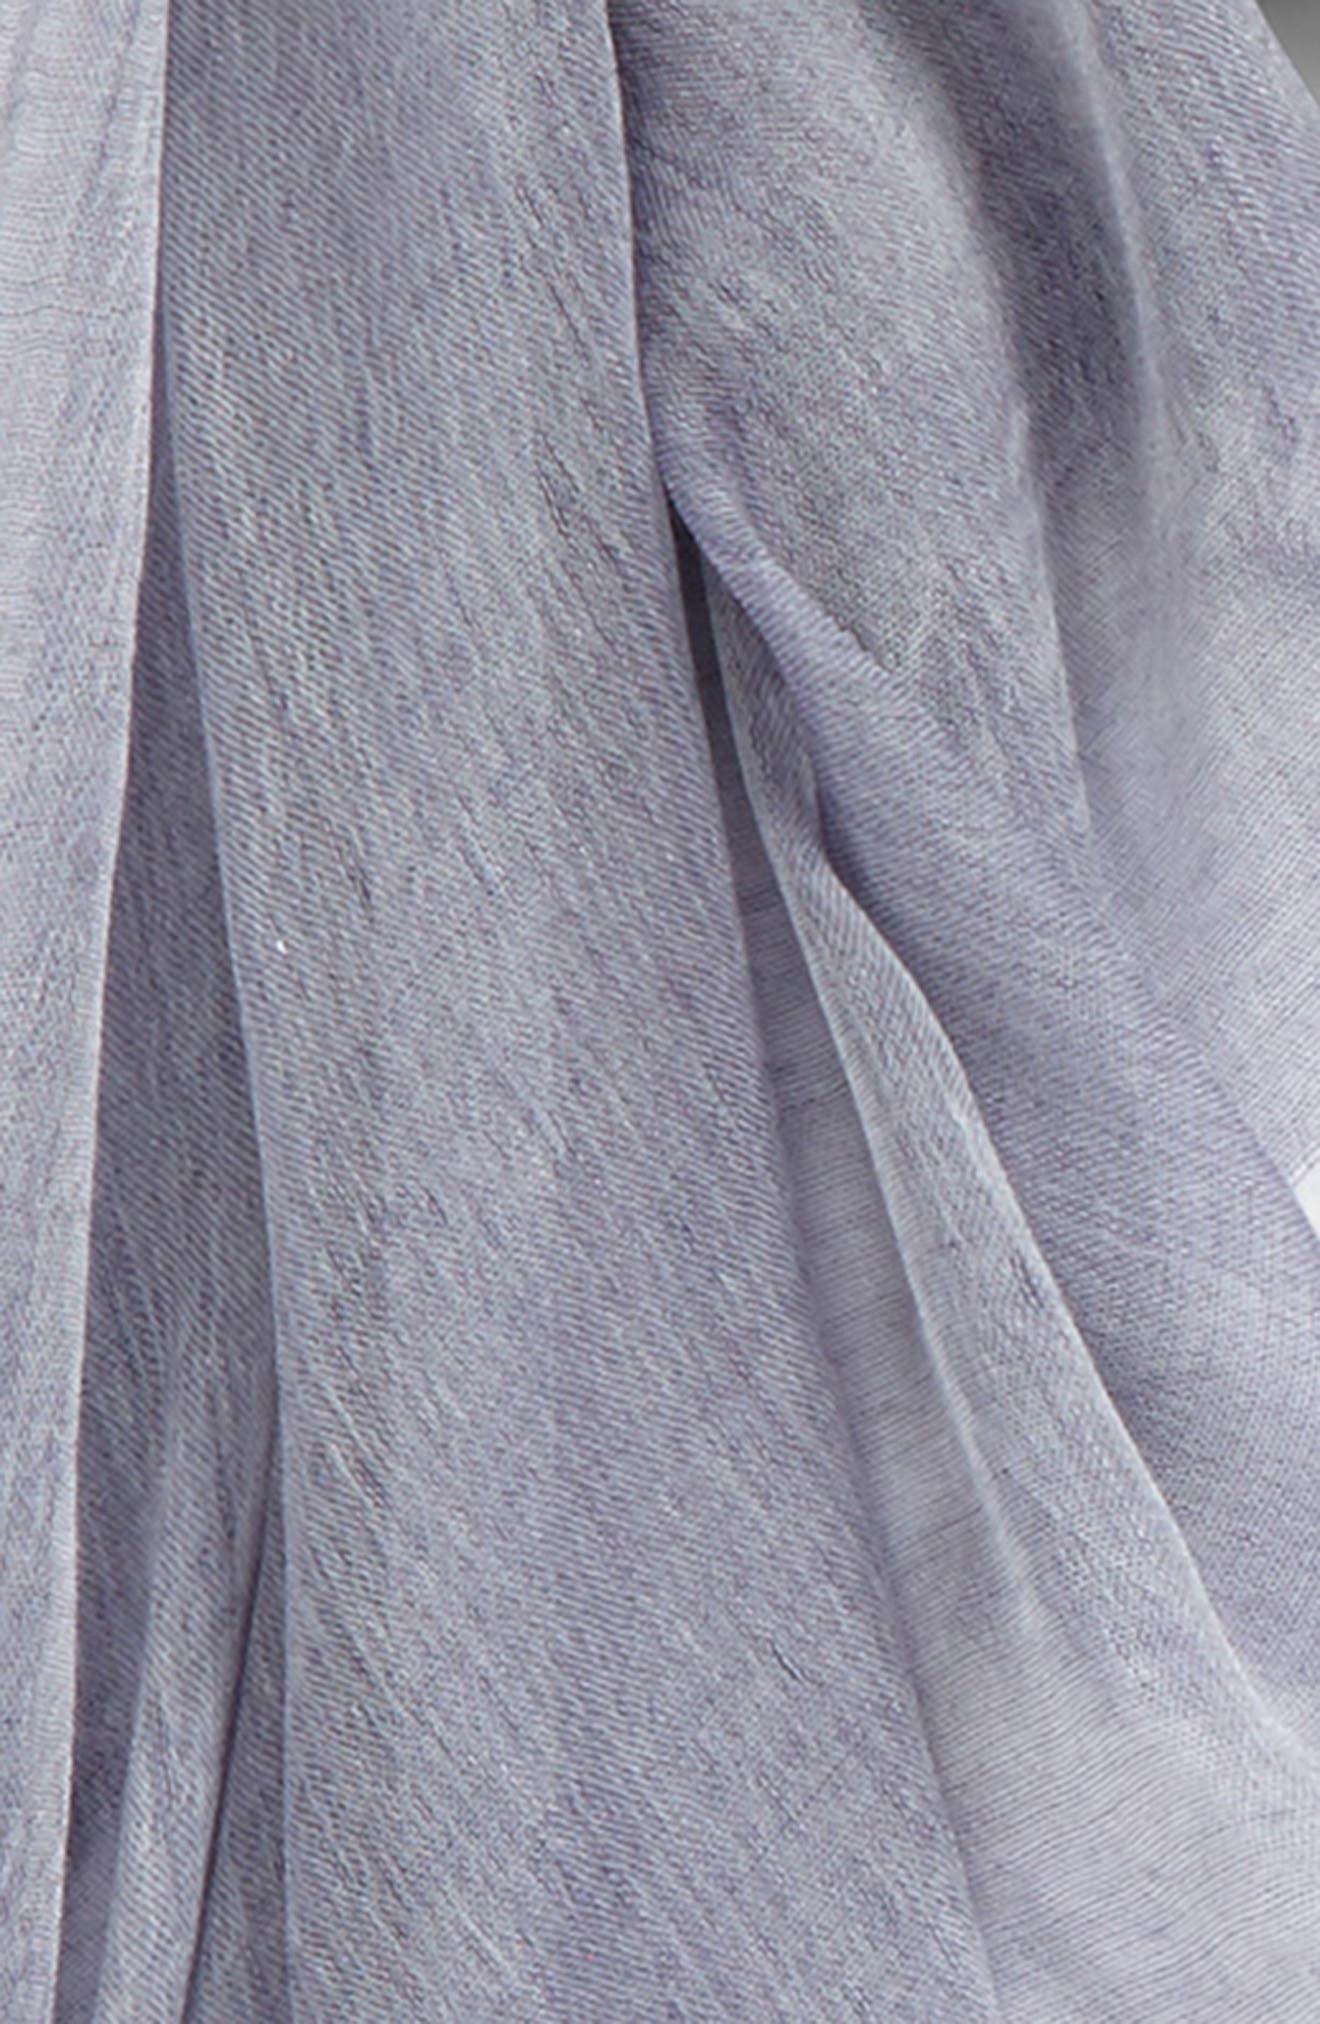 Modal Silk Blend Scarf,                             Alternate thumbnail 3, color,                             Navy Patriot Combo